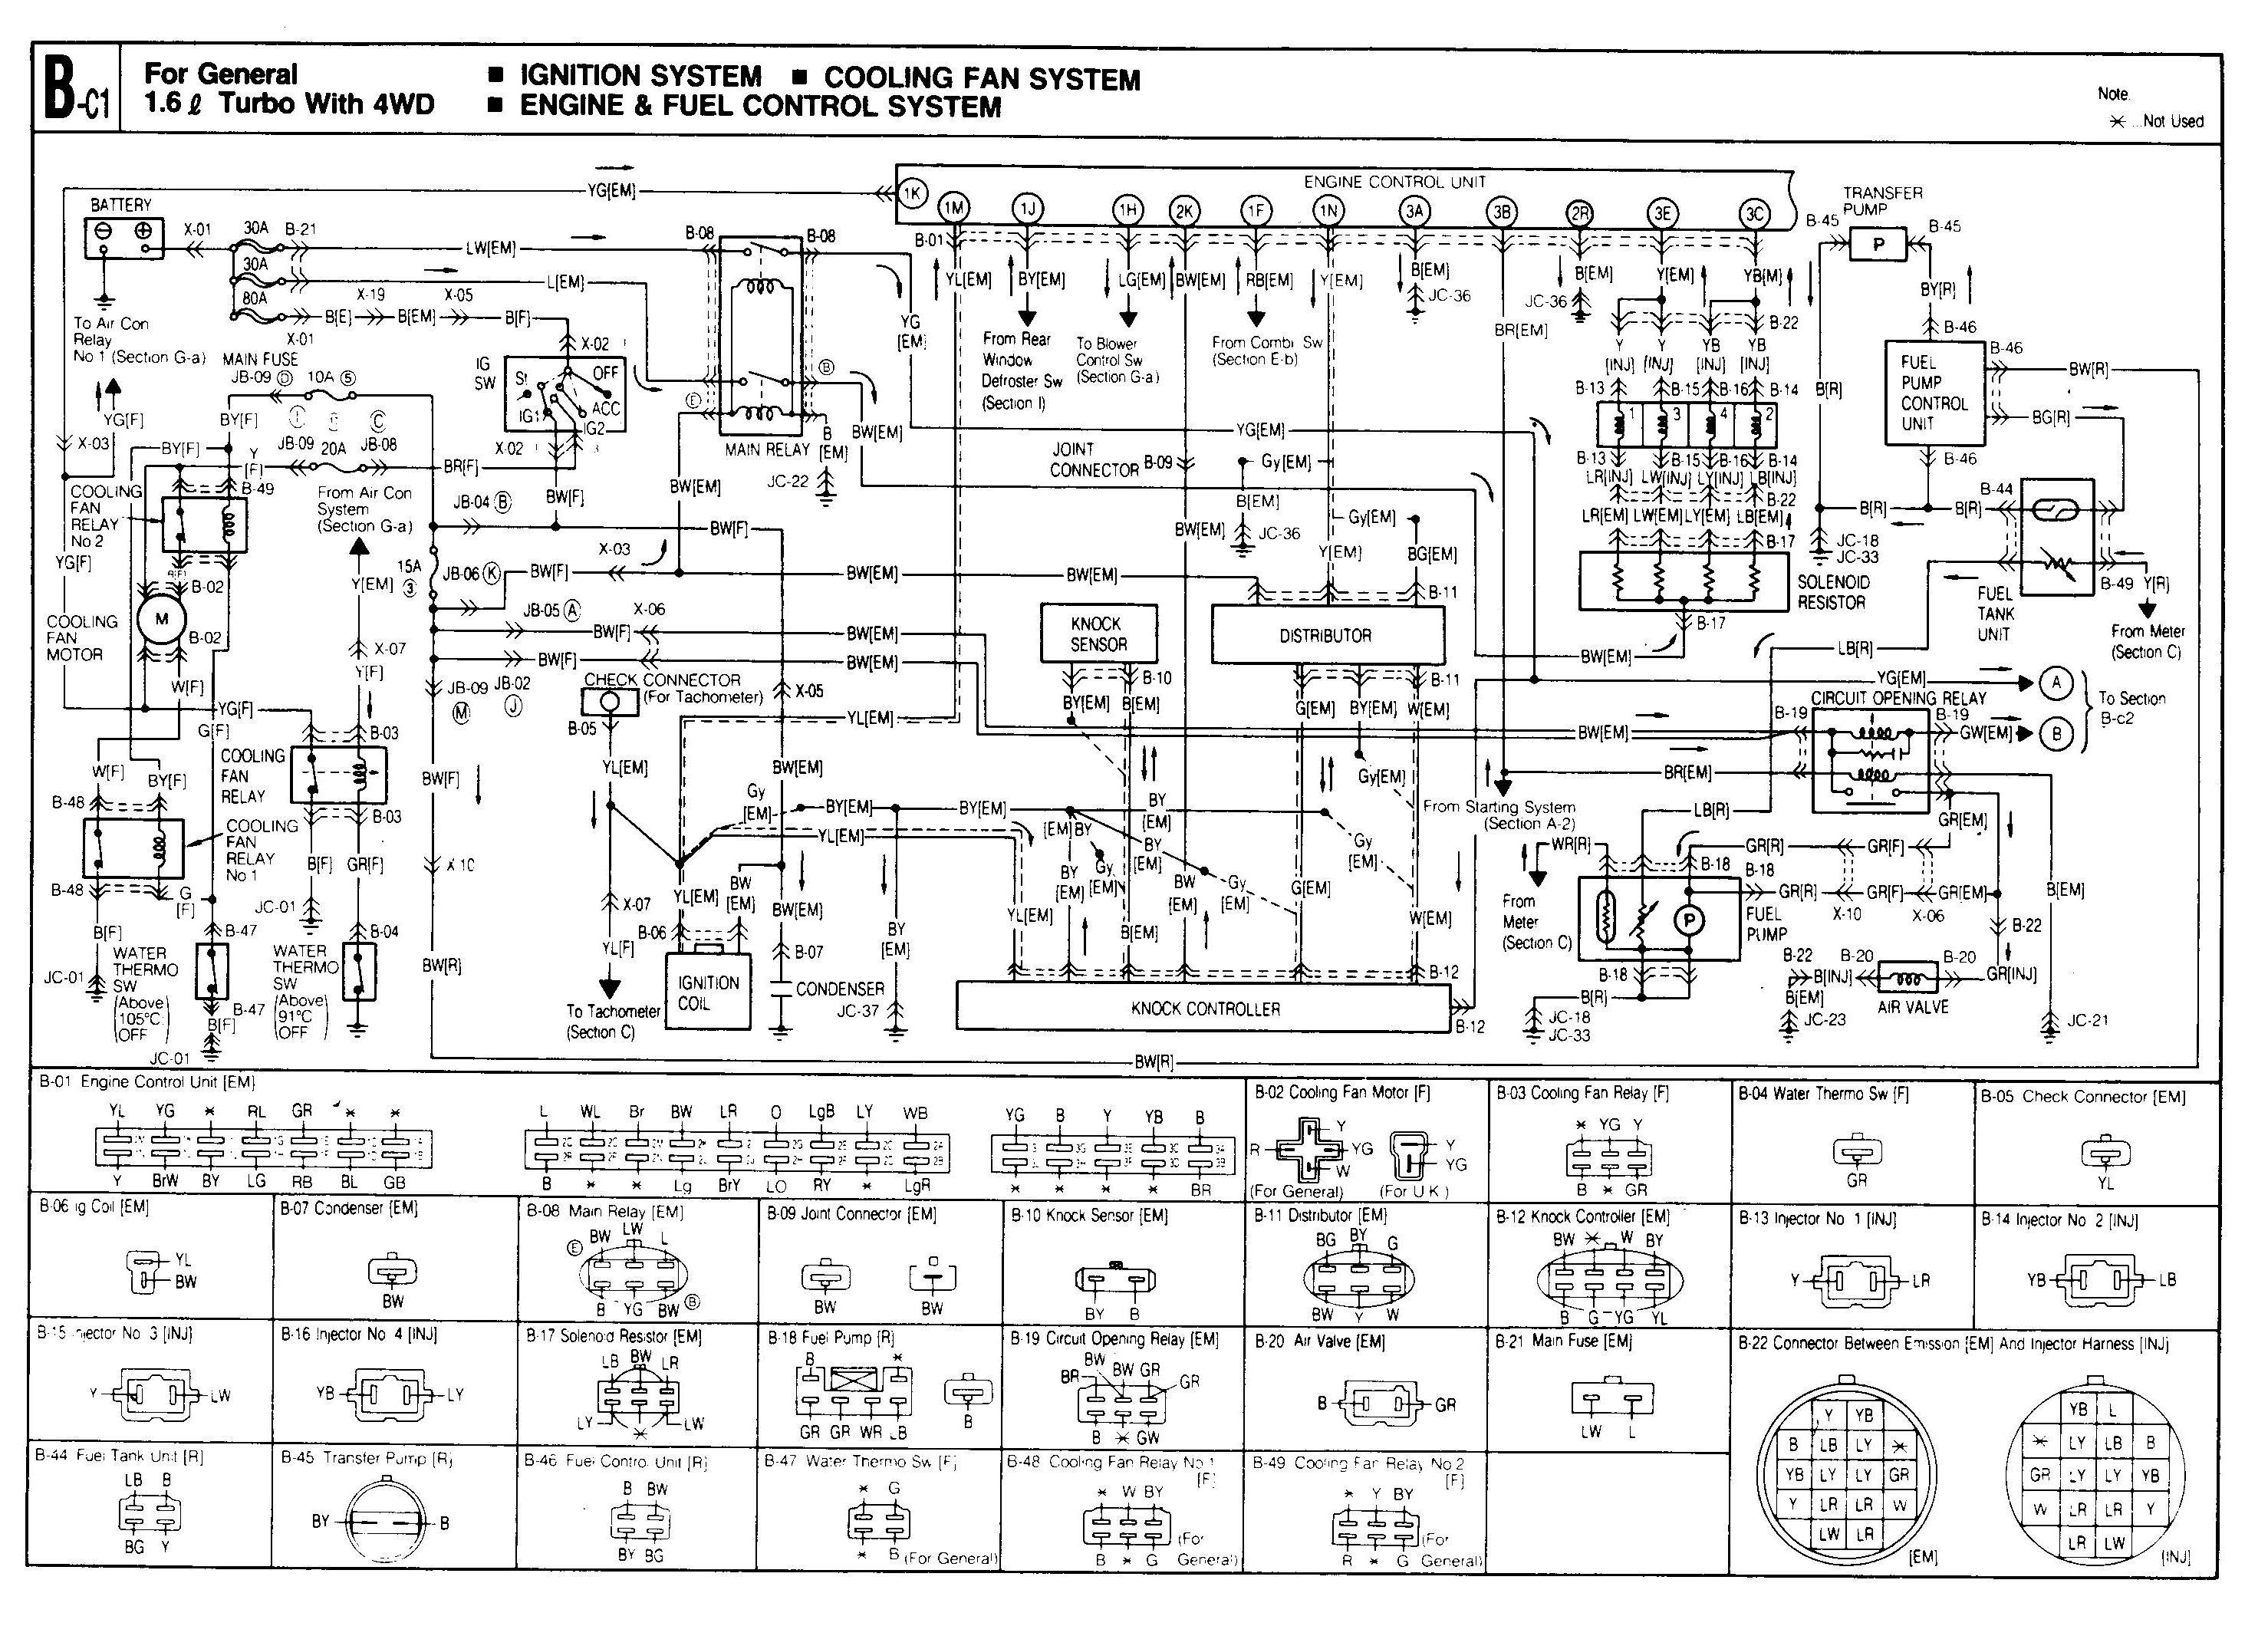 1986 Mazda B2000 Engine Diagram 1989 Mazda 323 Wiring Diagram Wiring Diagrams Of 1986 Mazda B2000 Engine Diagram